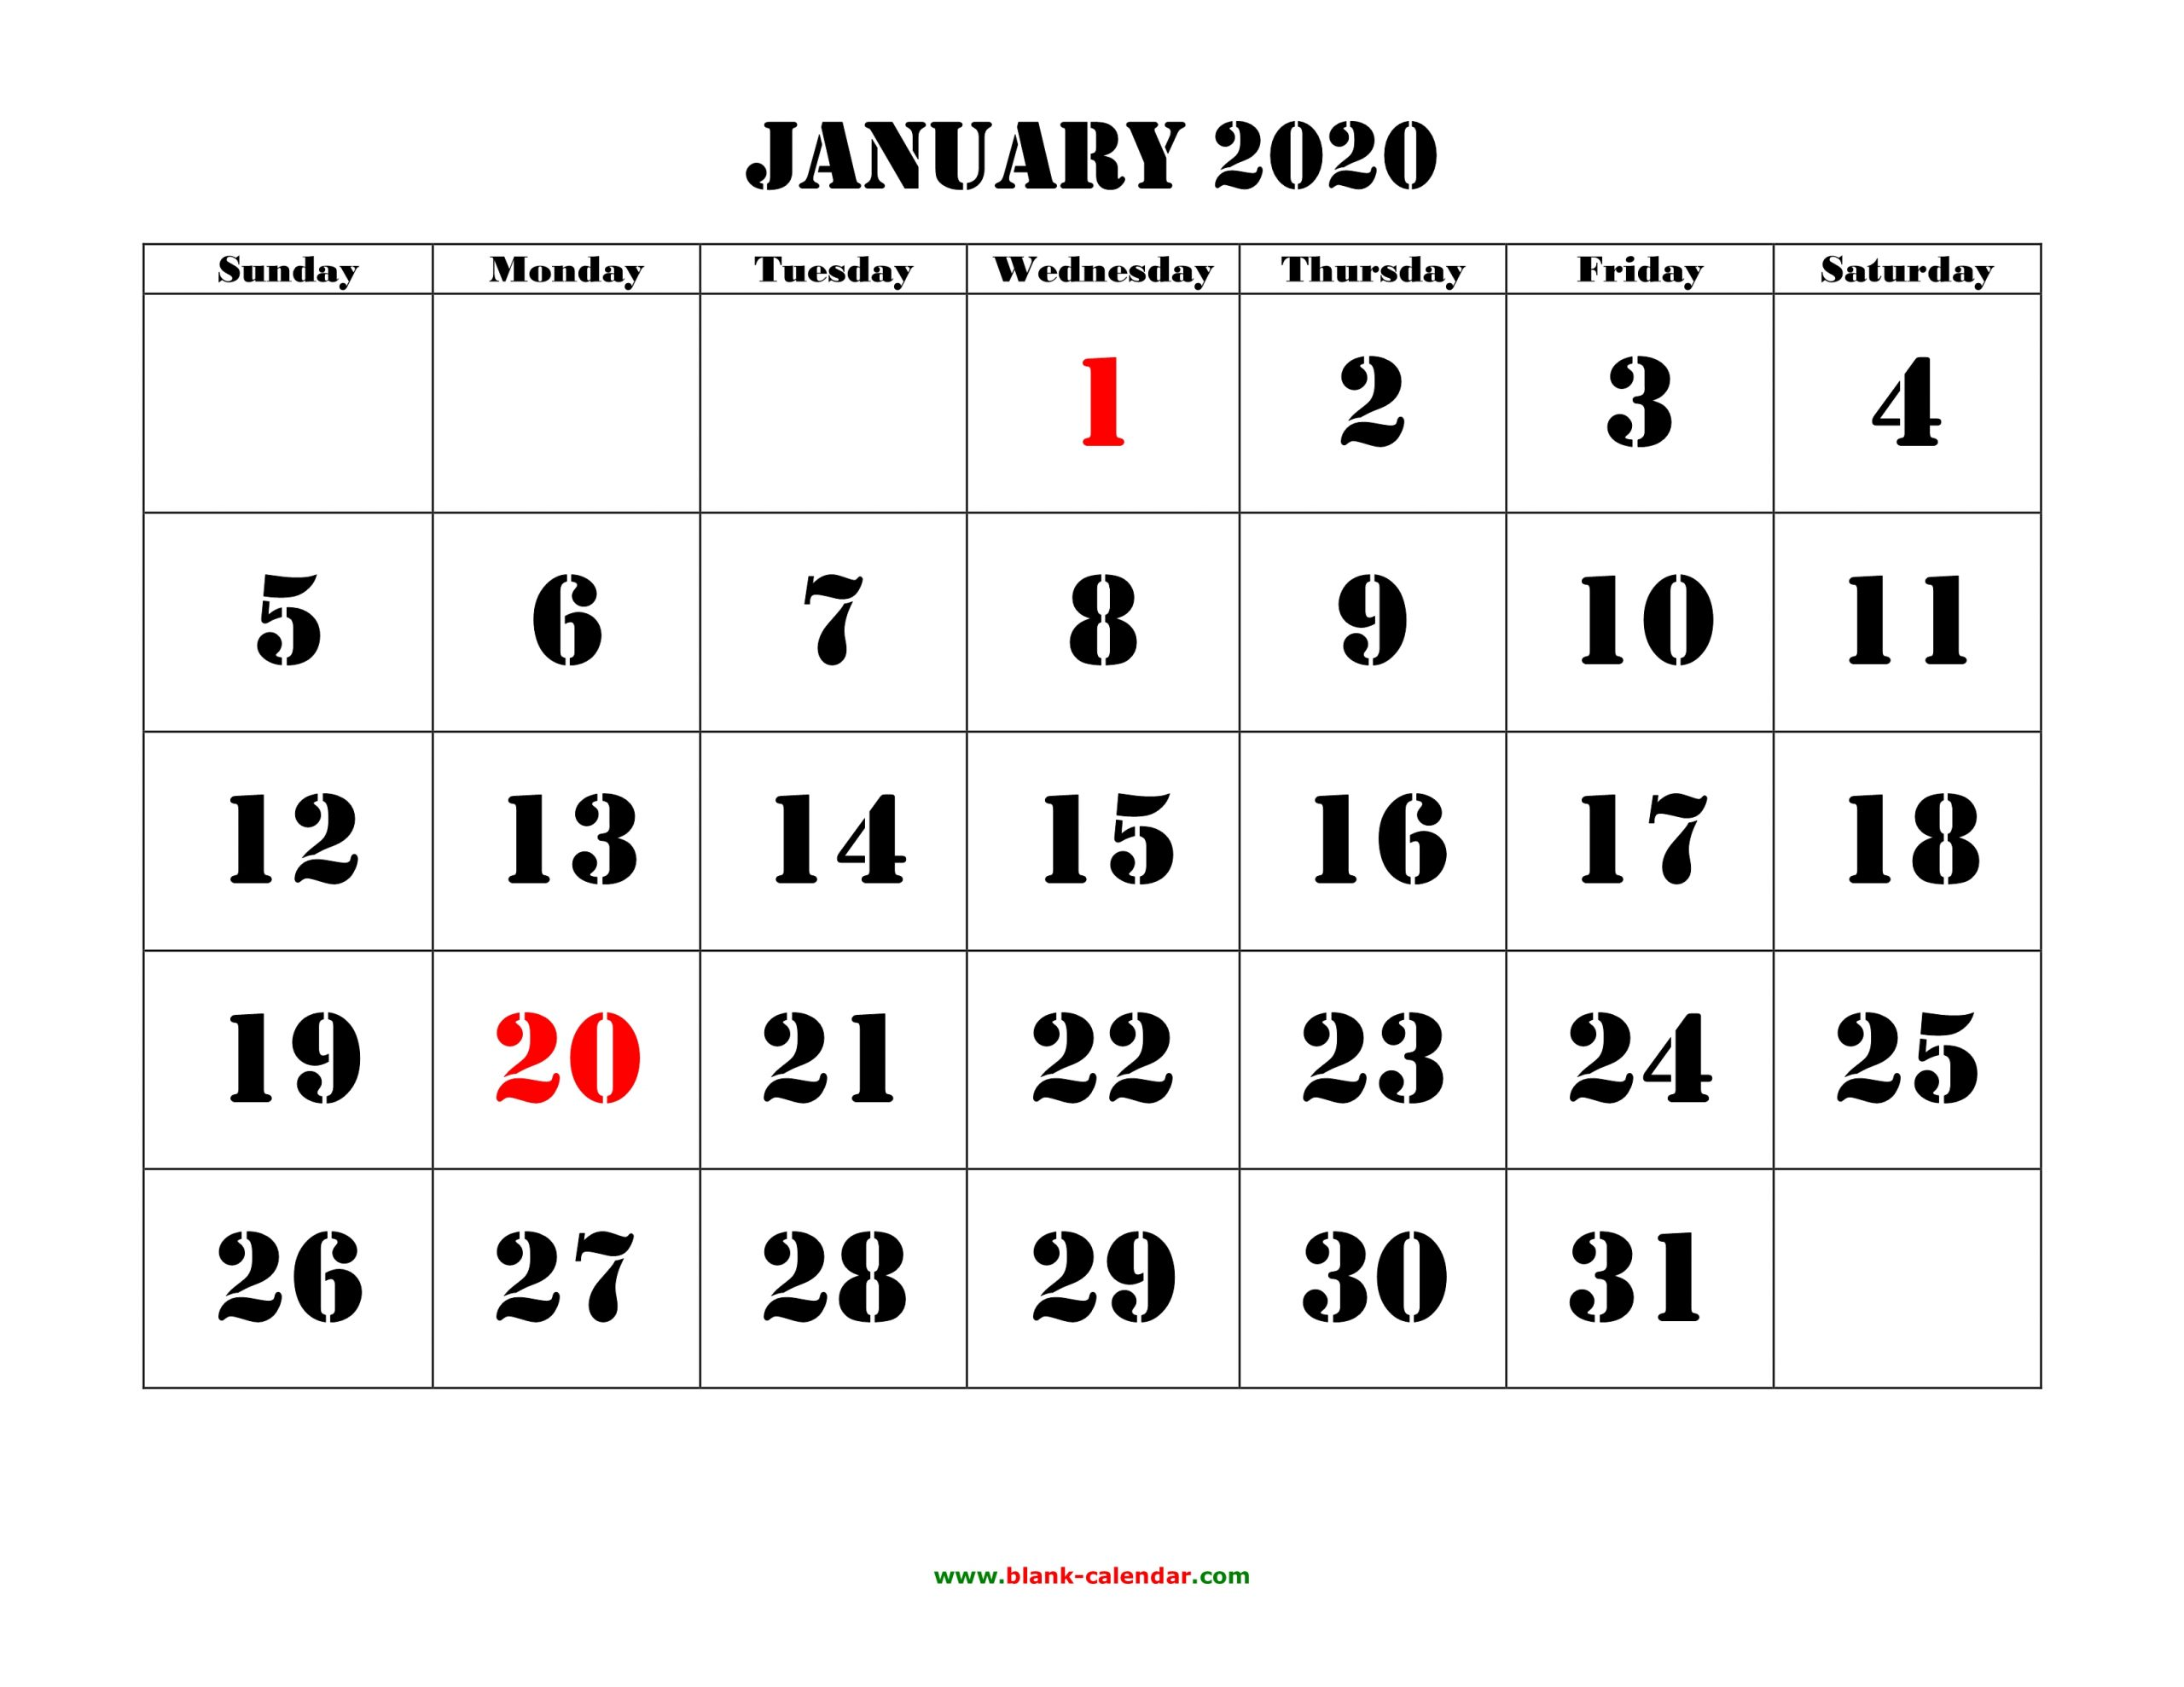 Free Download Printable January 2020 Calendar, Large Font